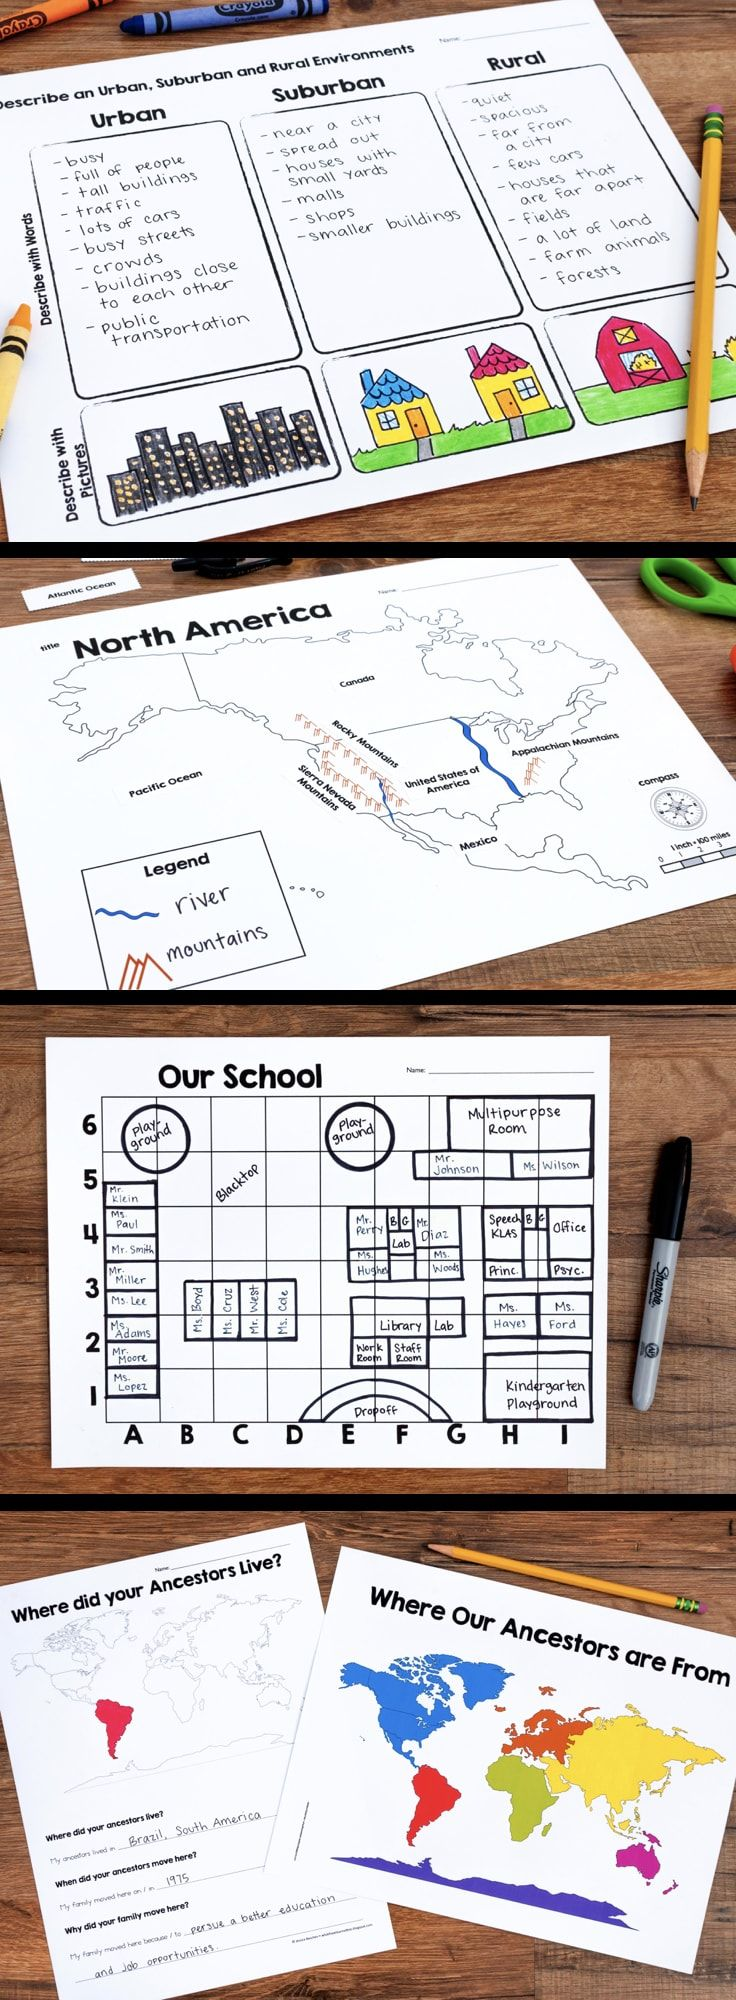 best education images on pinterest architectural models